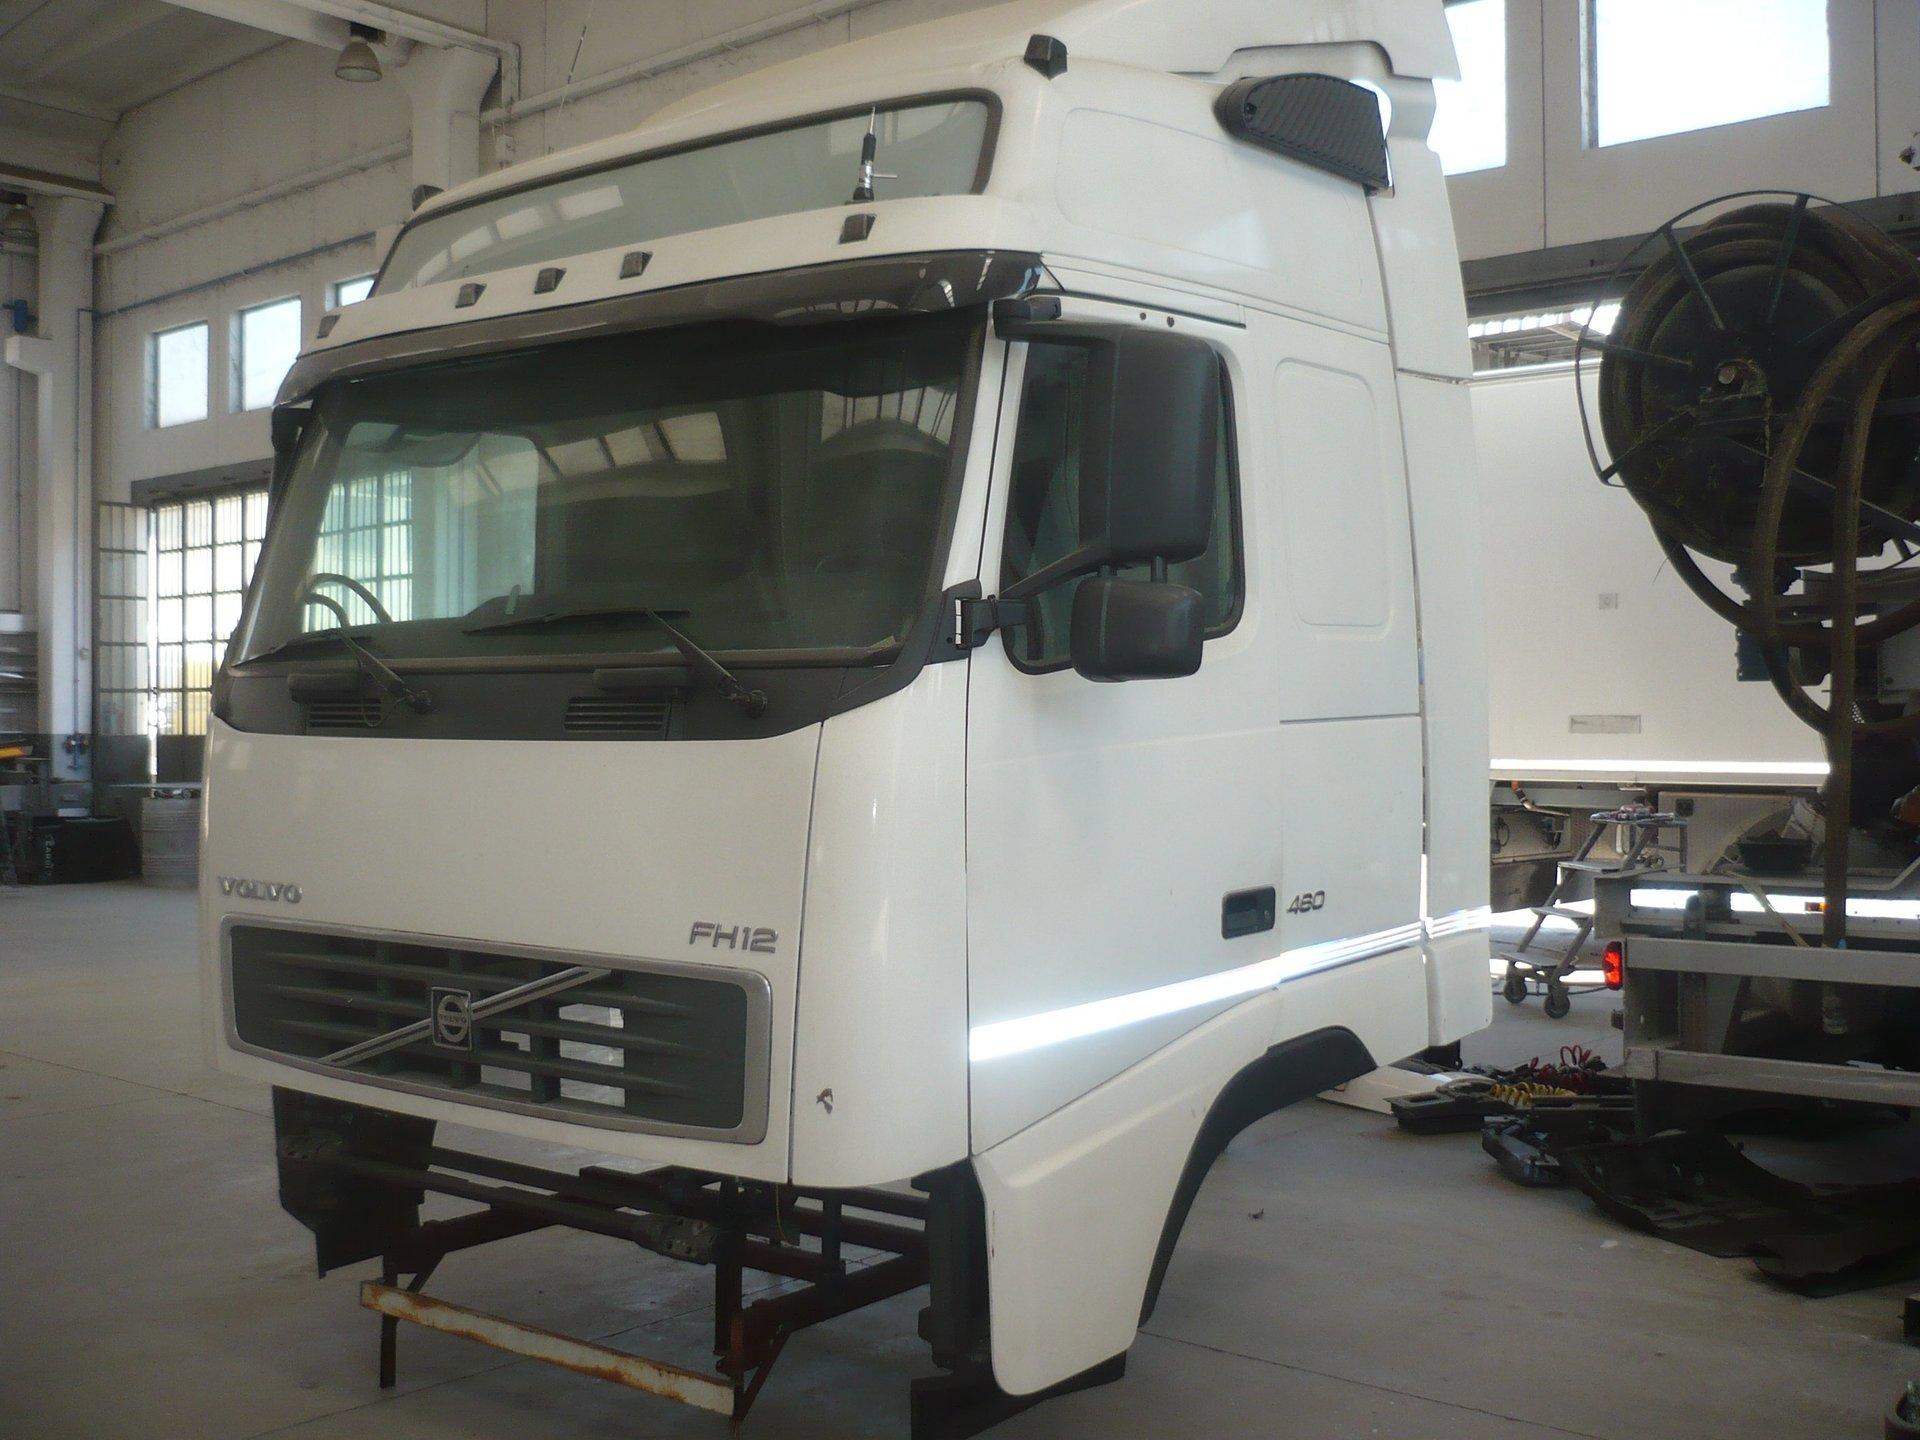 Cabina Volvo Fh V2 460 Gt Completa Vista Trequarti Smontata